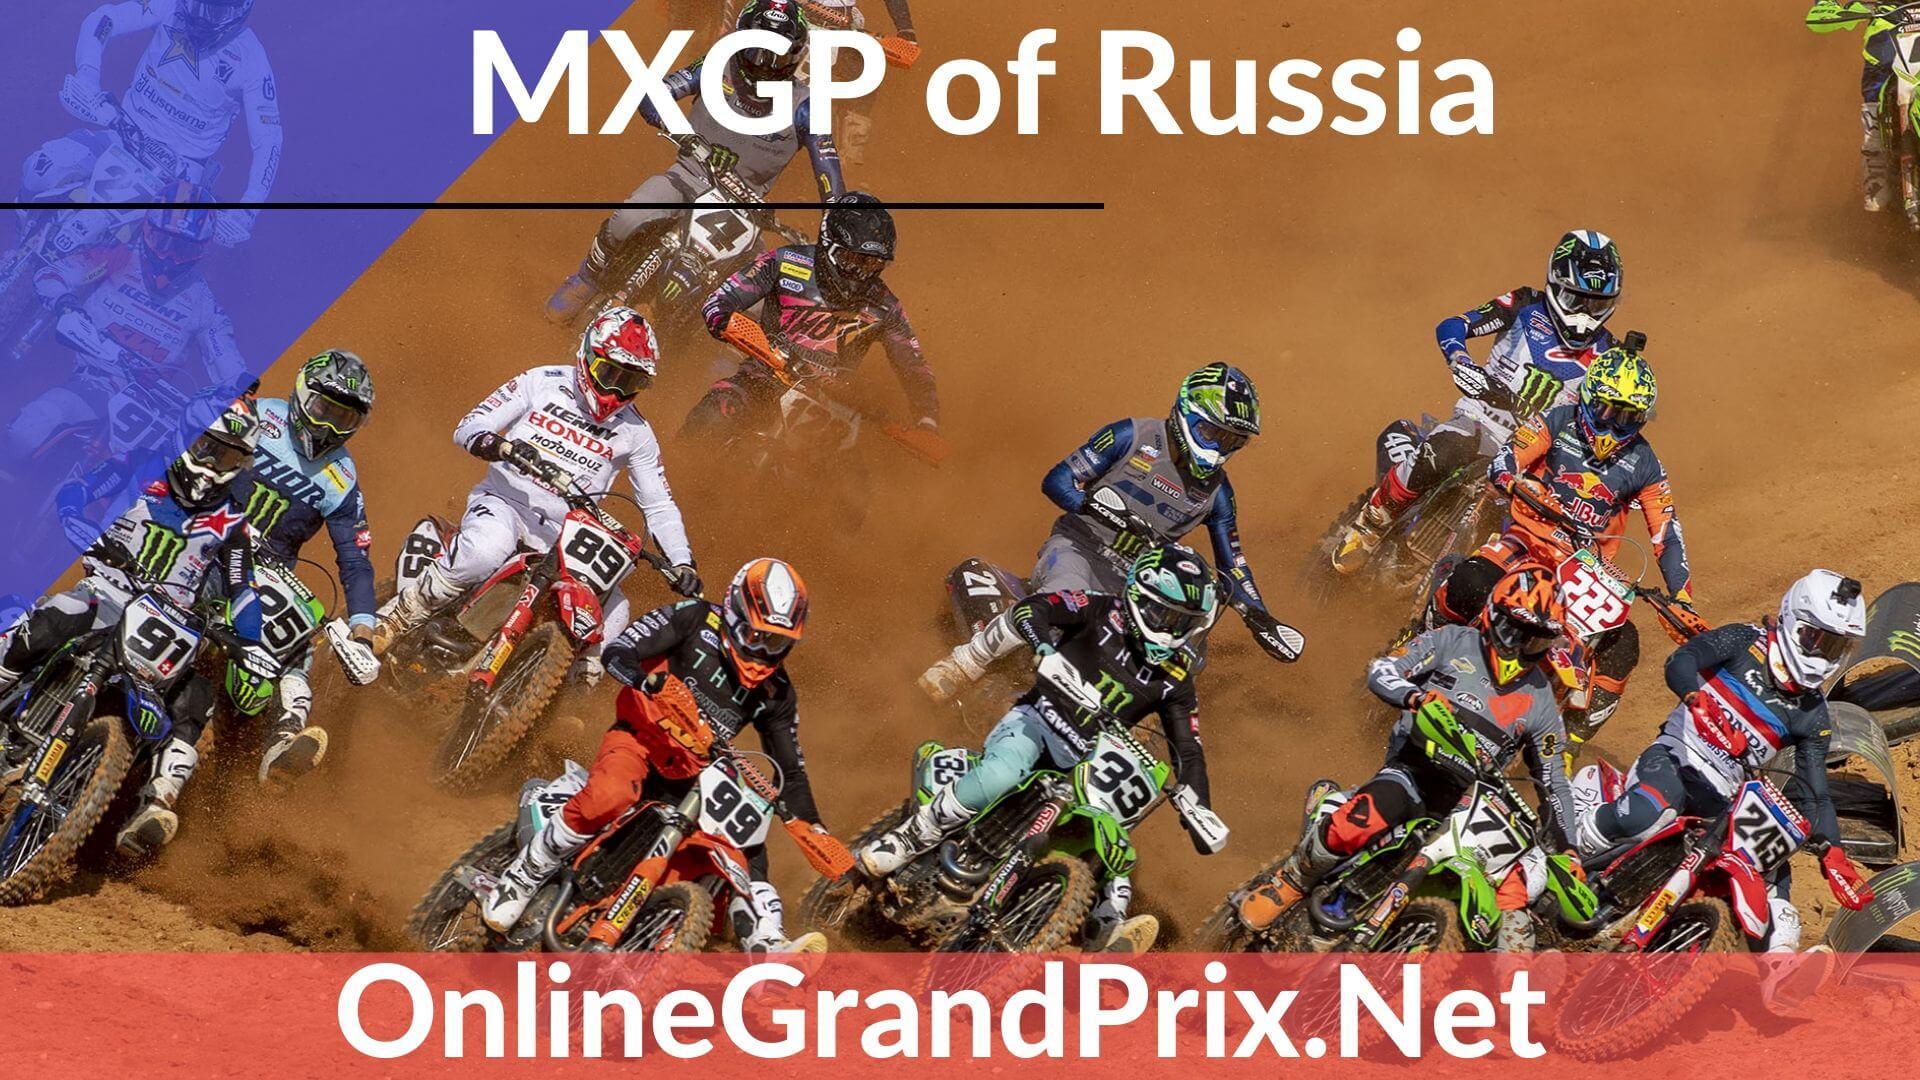 Russia MXGP Live Stream 2020 | FIM MotoCross WC